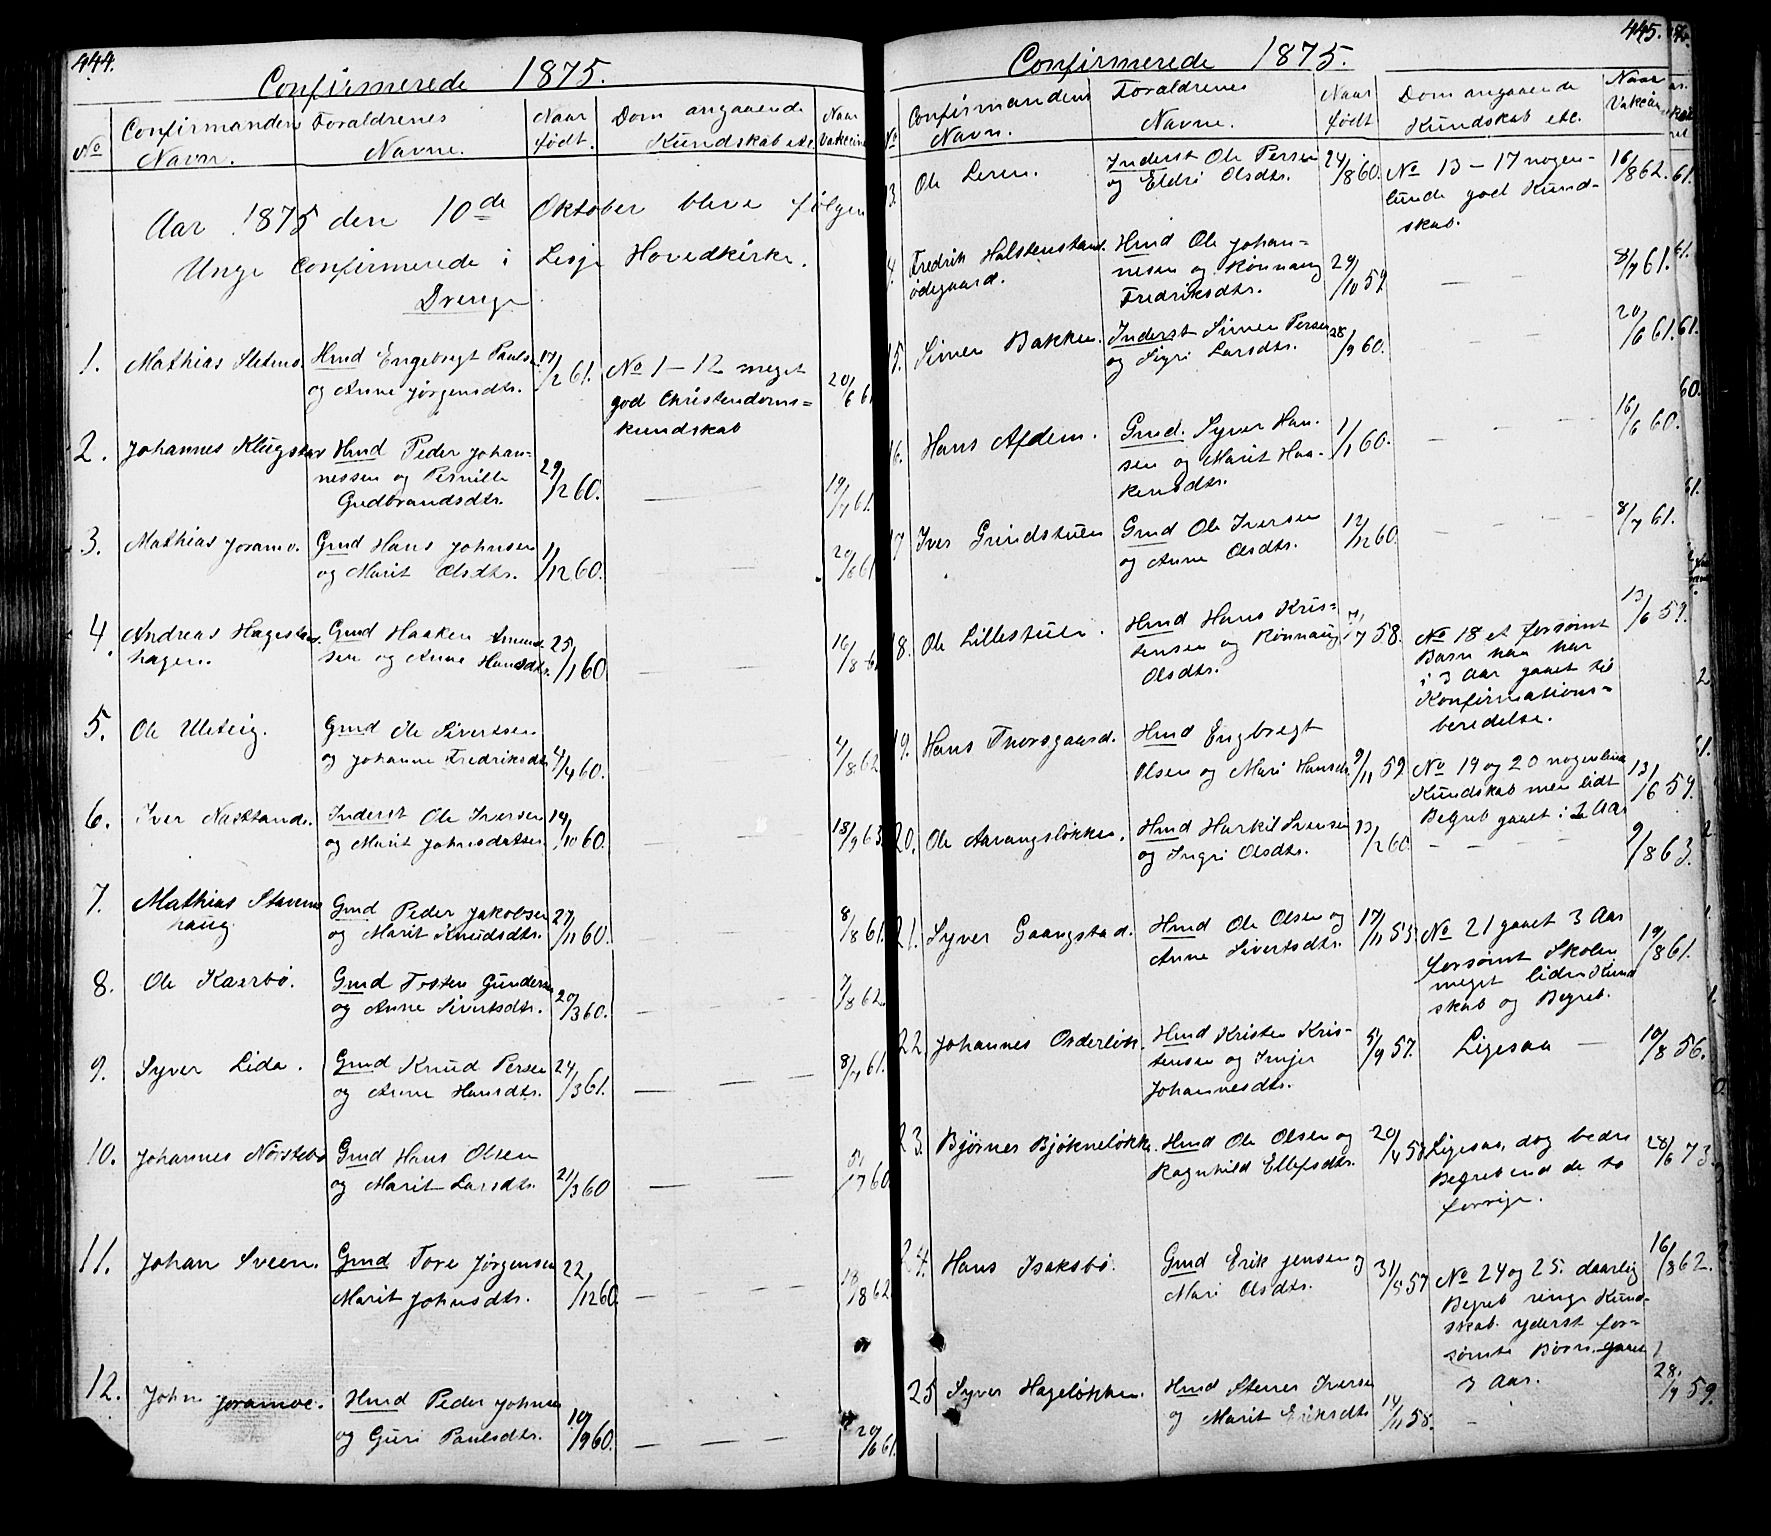 SAH, Lesja prestekontor, Klokkerbok nr. 5, 1850-1894, s. 444-445